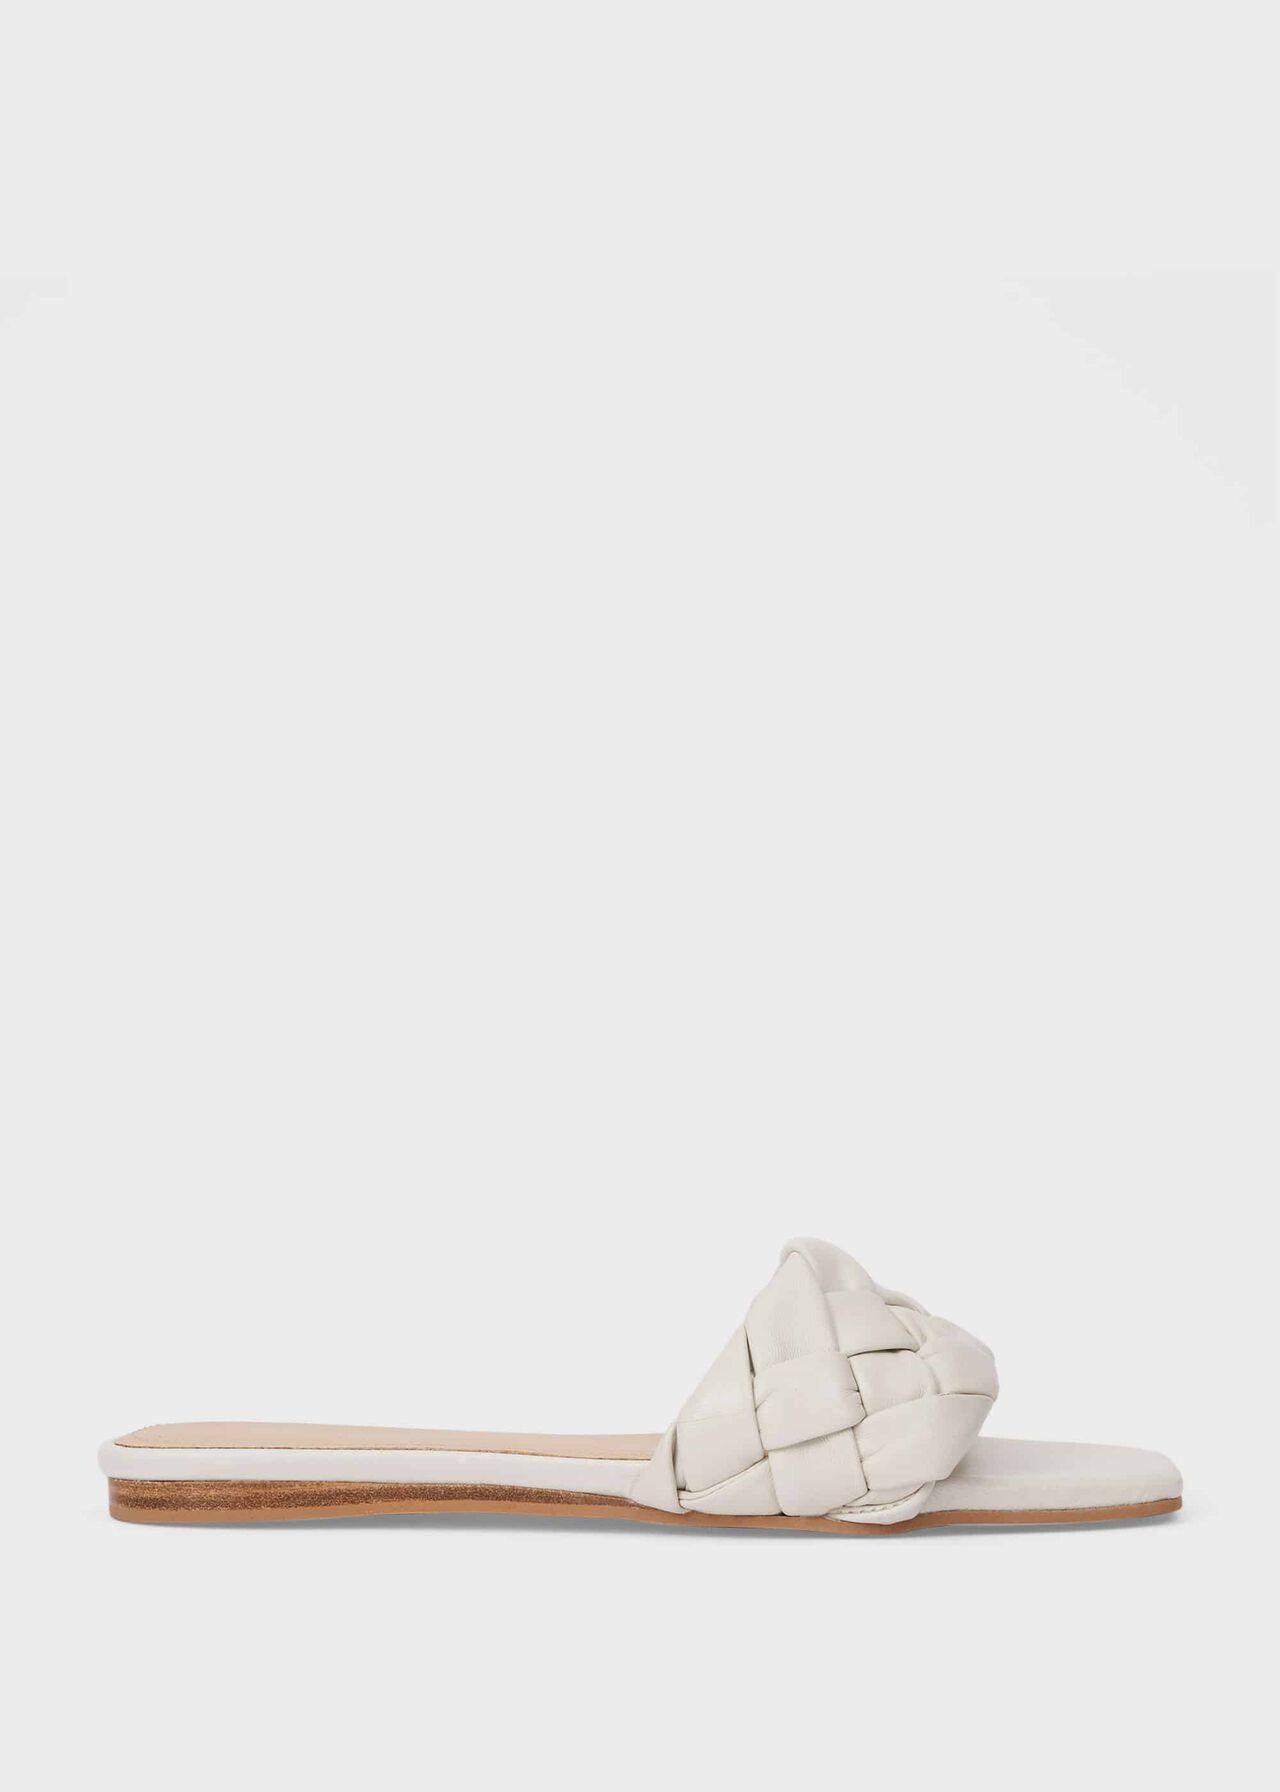 Wren Leather Sandals, White, hi-res